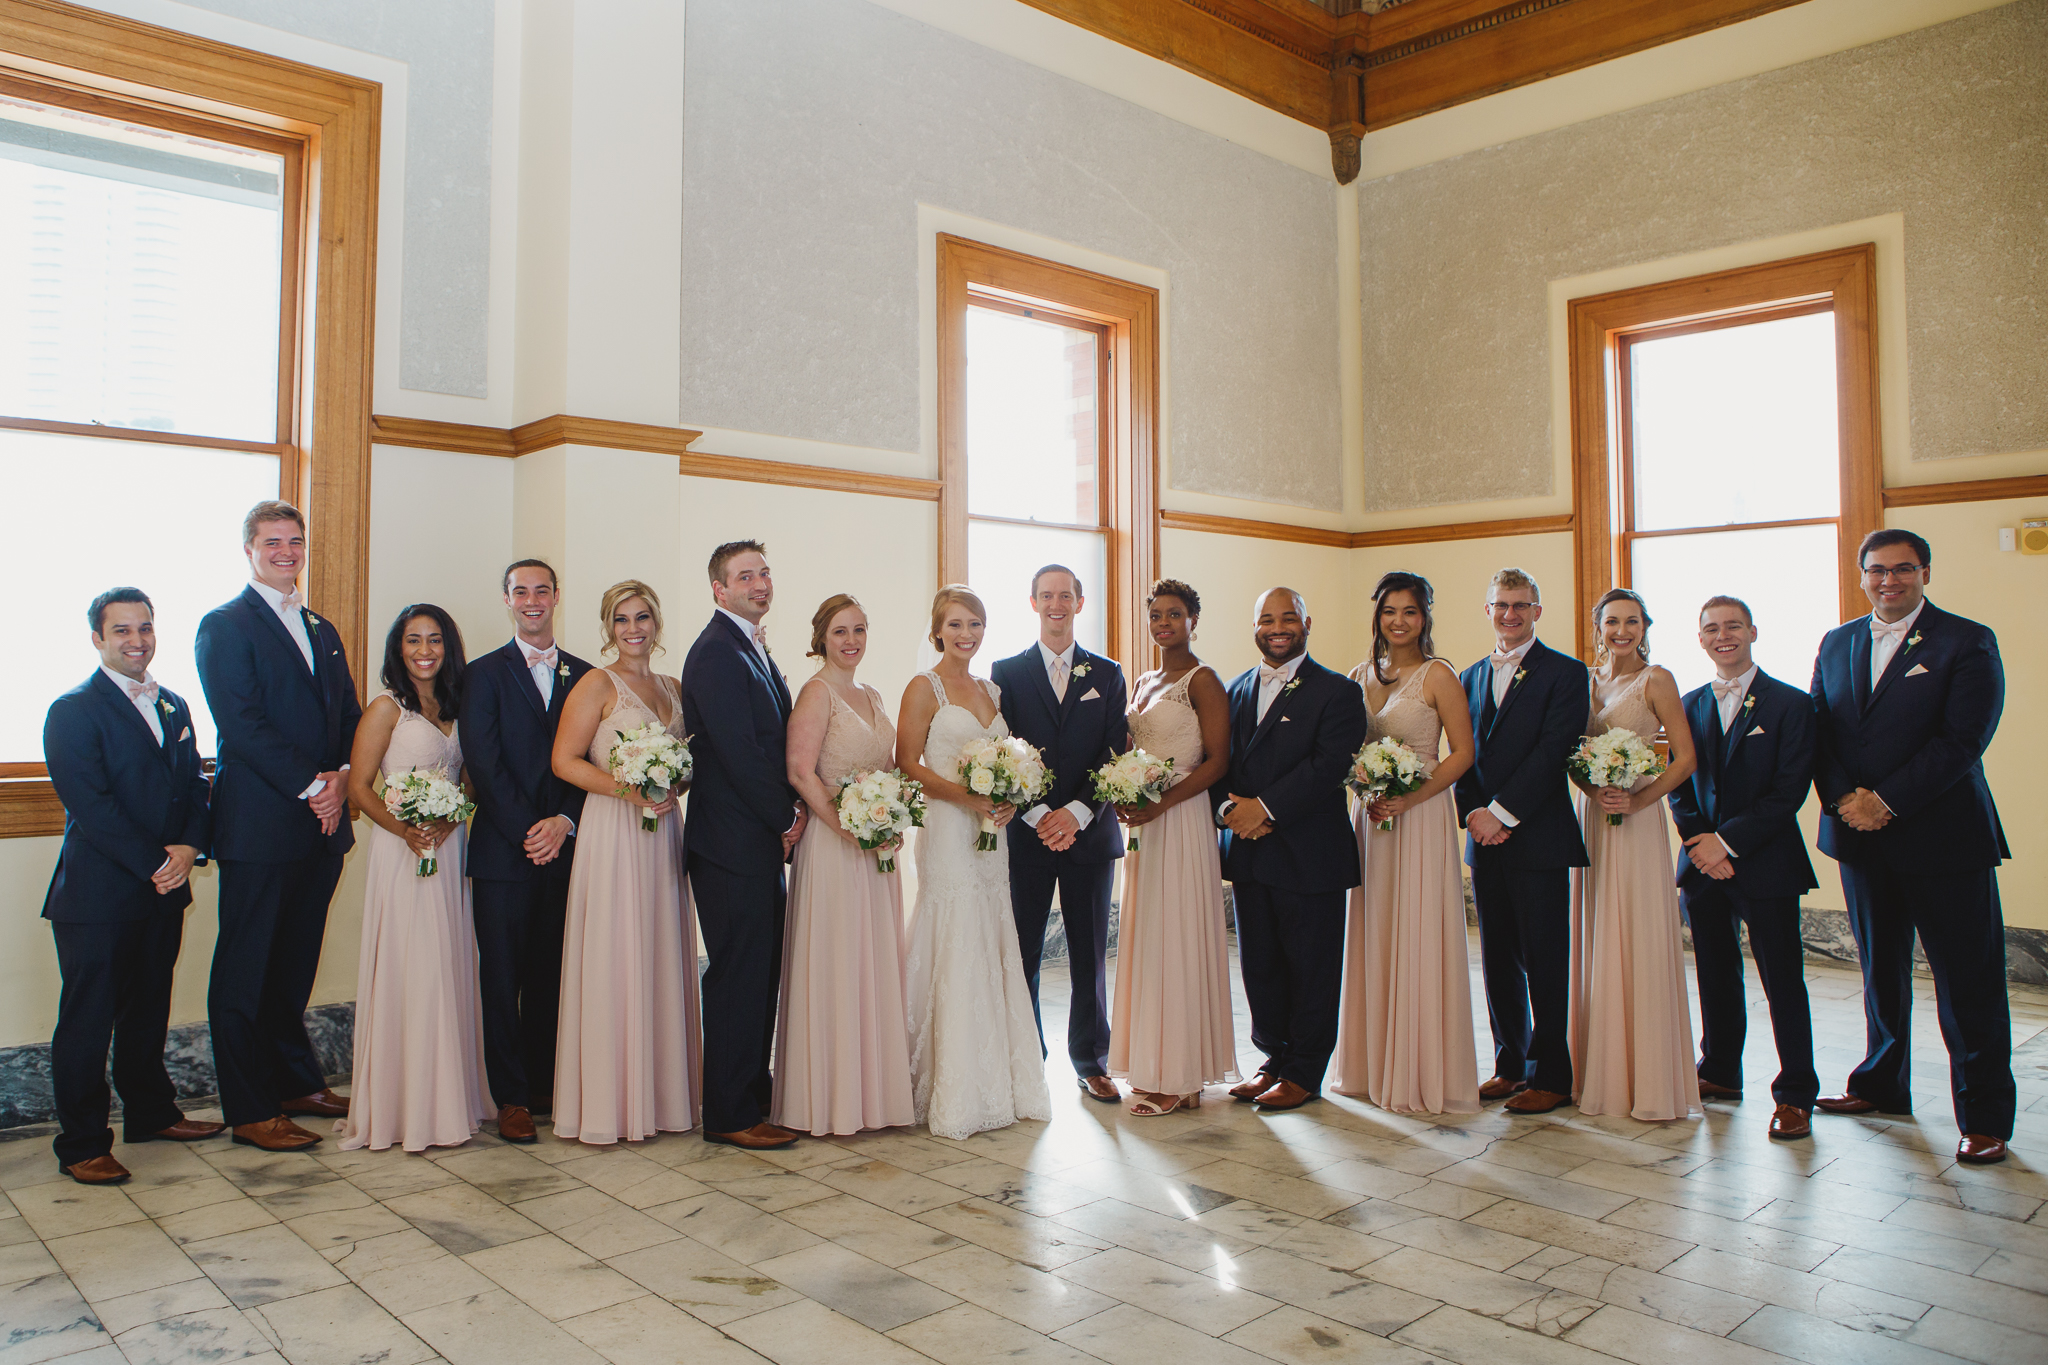 Michael and Kelly - the ashton depot - wedding DFW - wedding photographer- elizalde photography (62 of 150).jpg